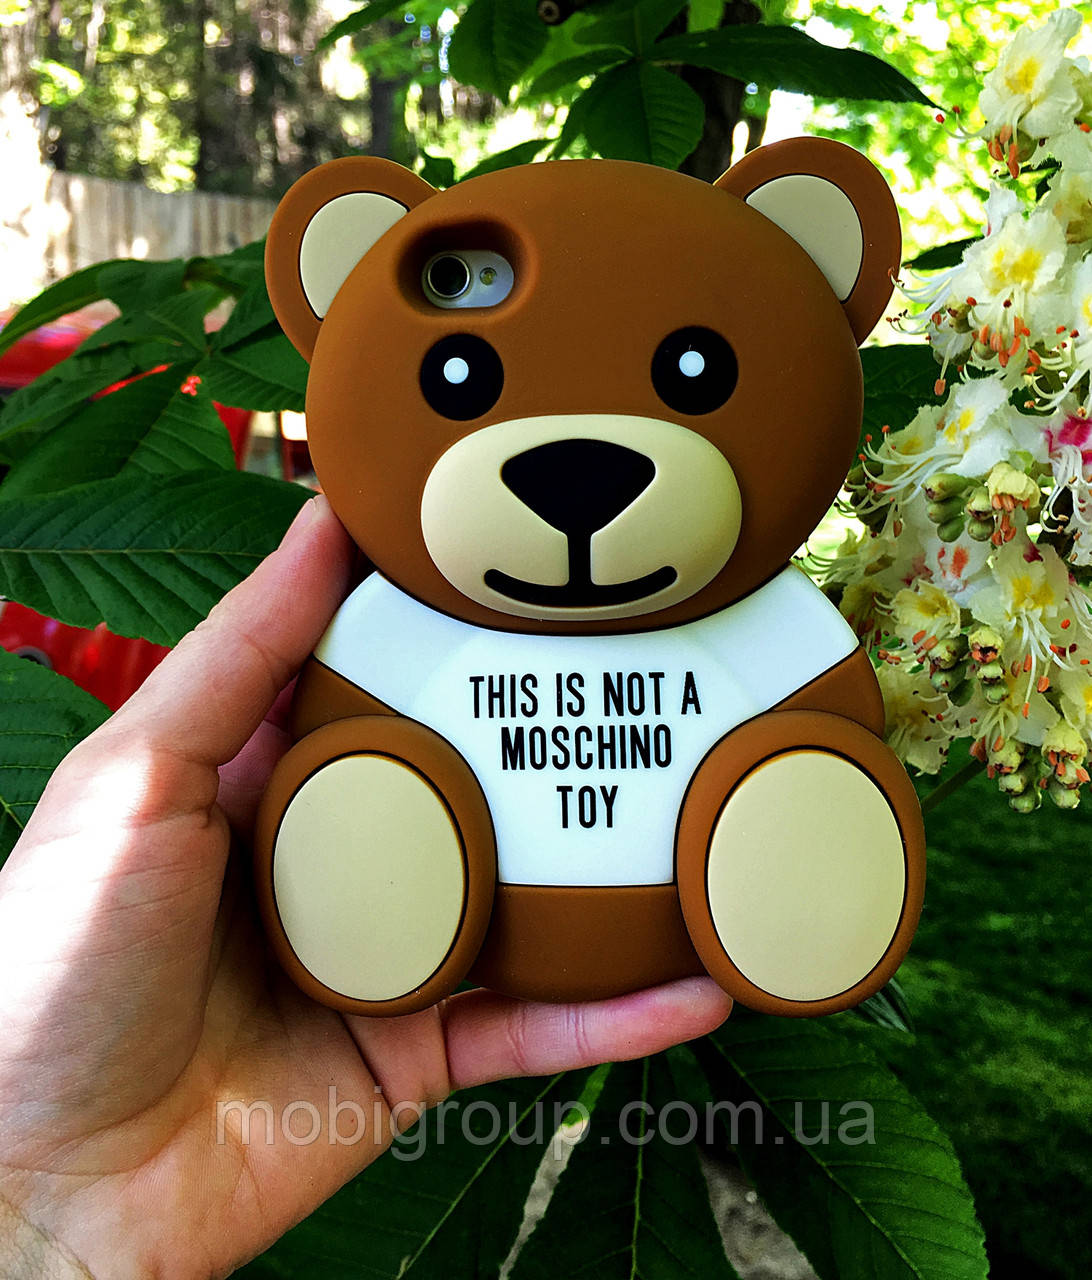 Чехол накладка медведь MOSCHINO для iPhone 4S/4